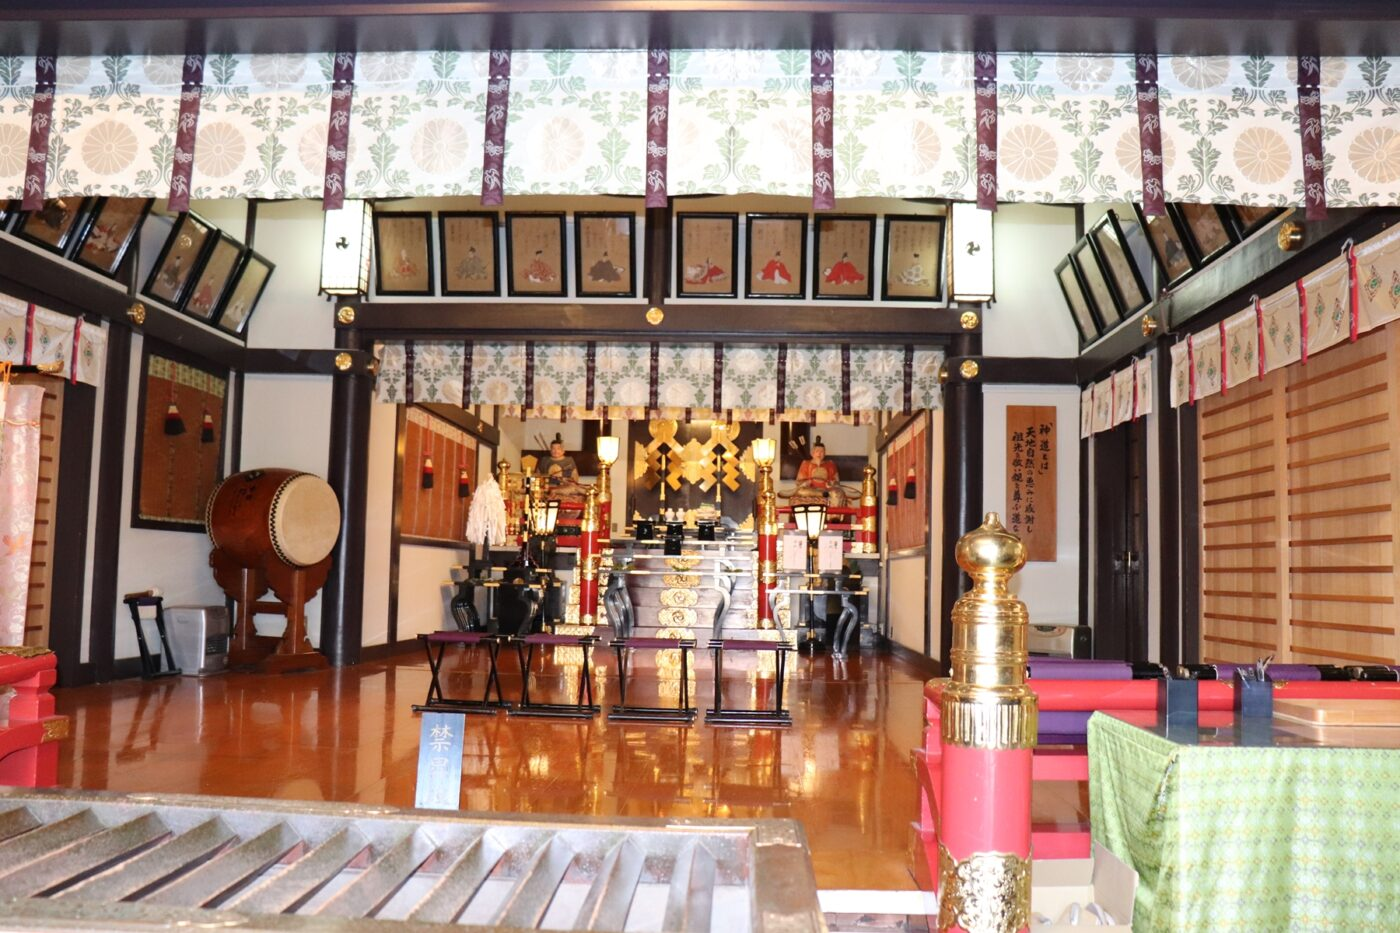 (四谷)須賀神社の写真